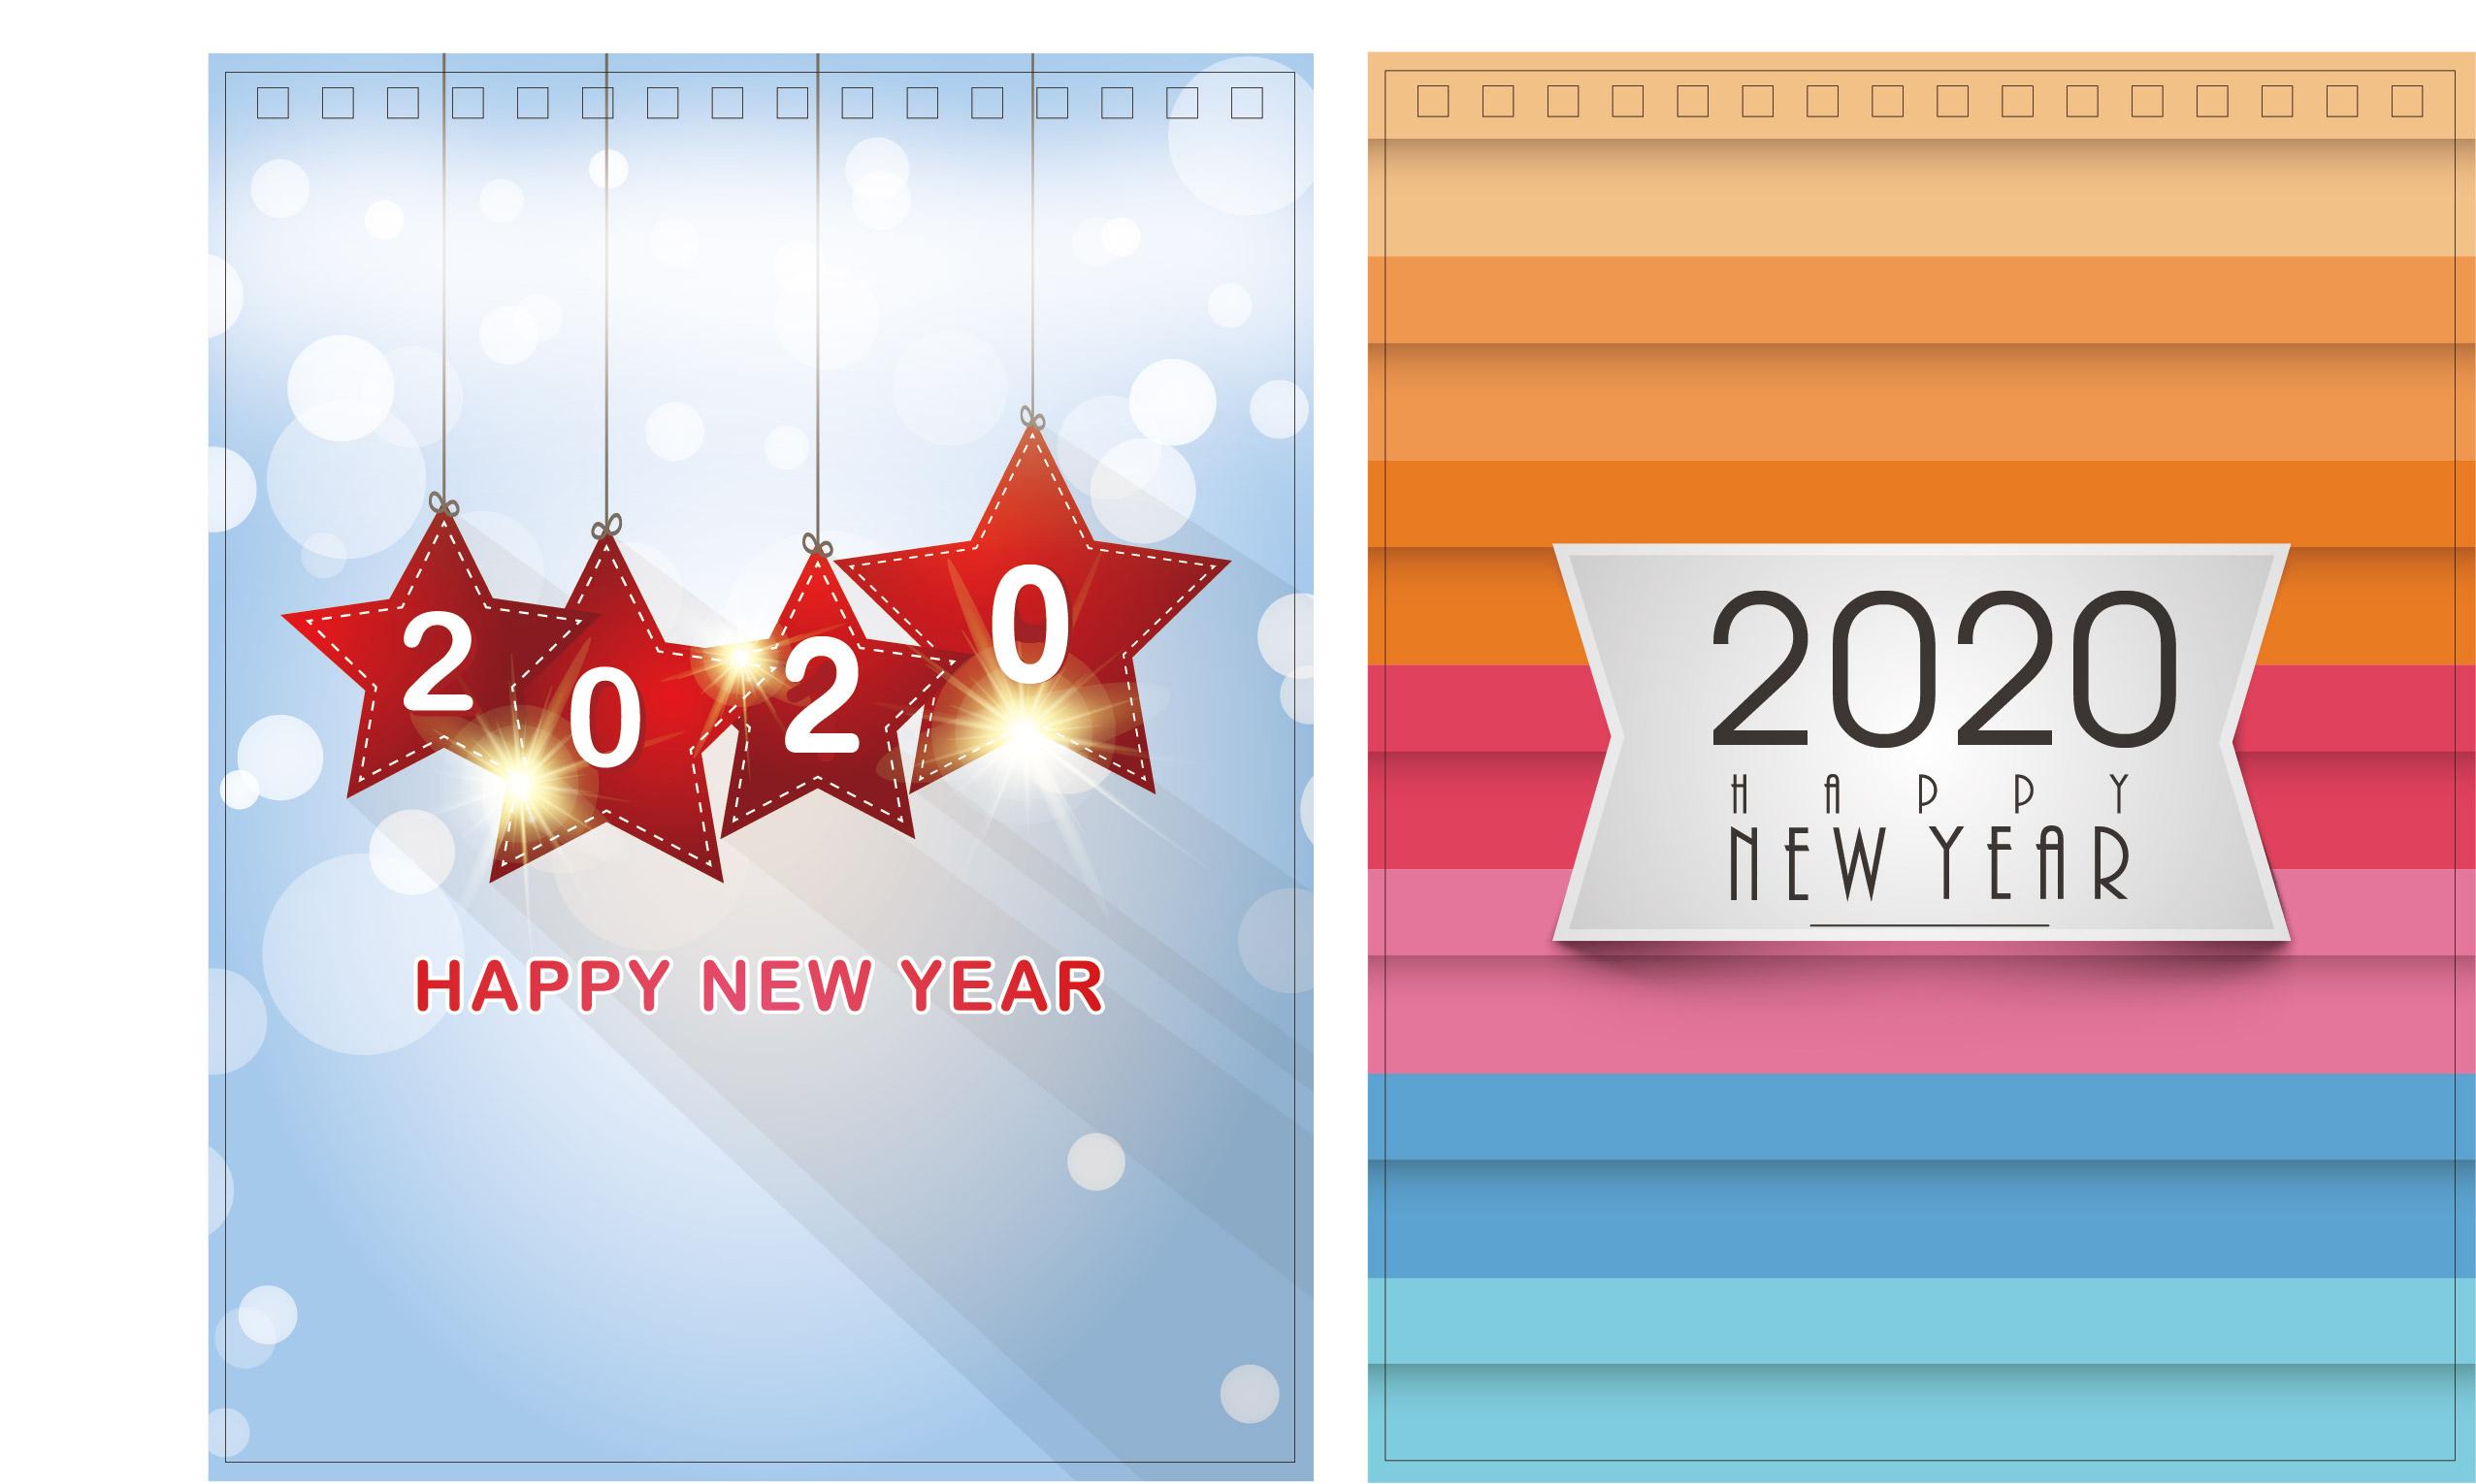 Print100 Desk CalendarA006